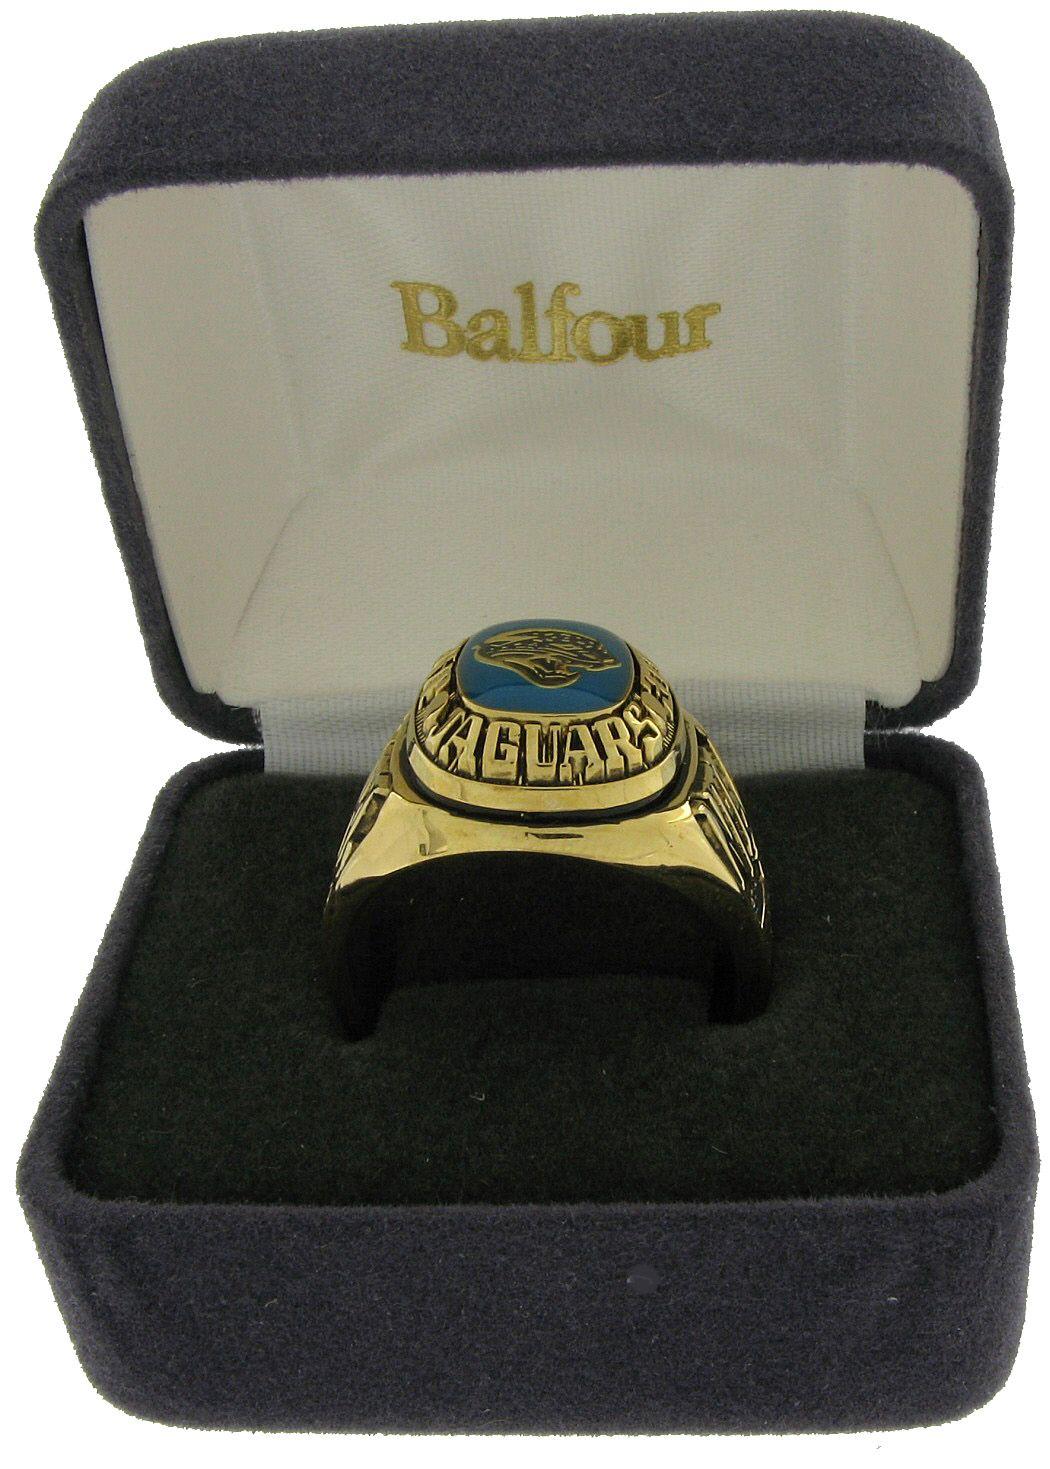 Balfour Ring Football NFL Team Jacksonville Jaguars Sz 9 5